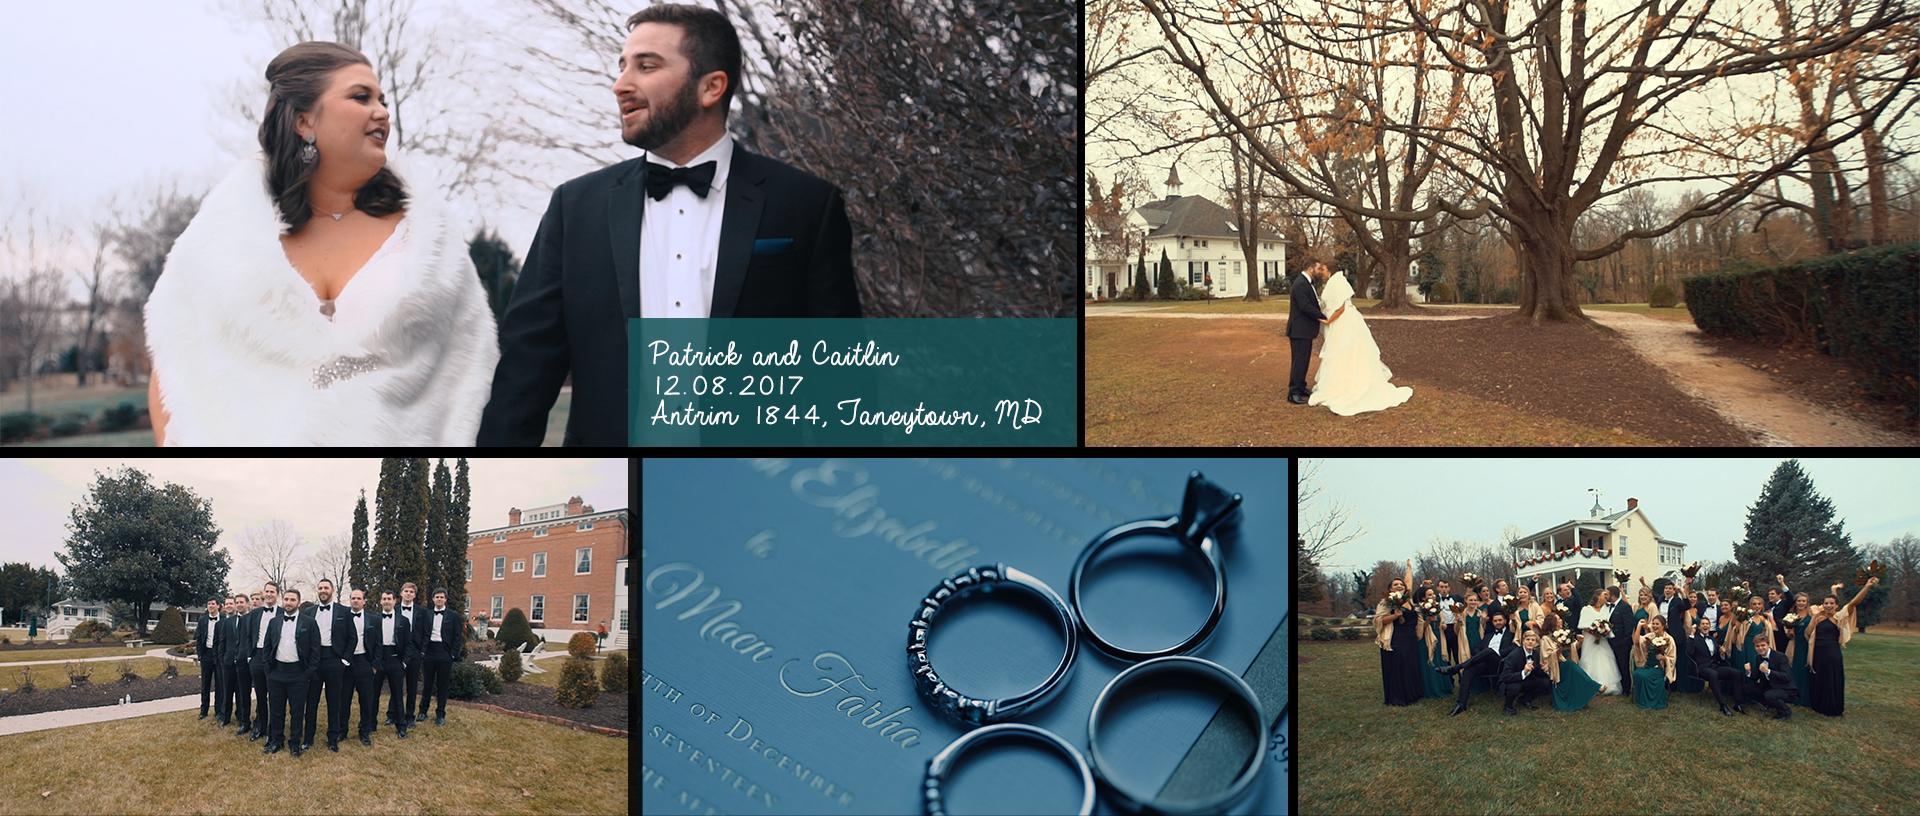 Patrick + Caitlin | Thurmont, Maryland | Antrim 1844